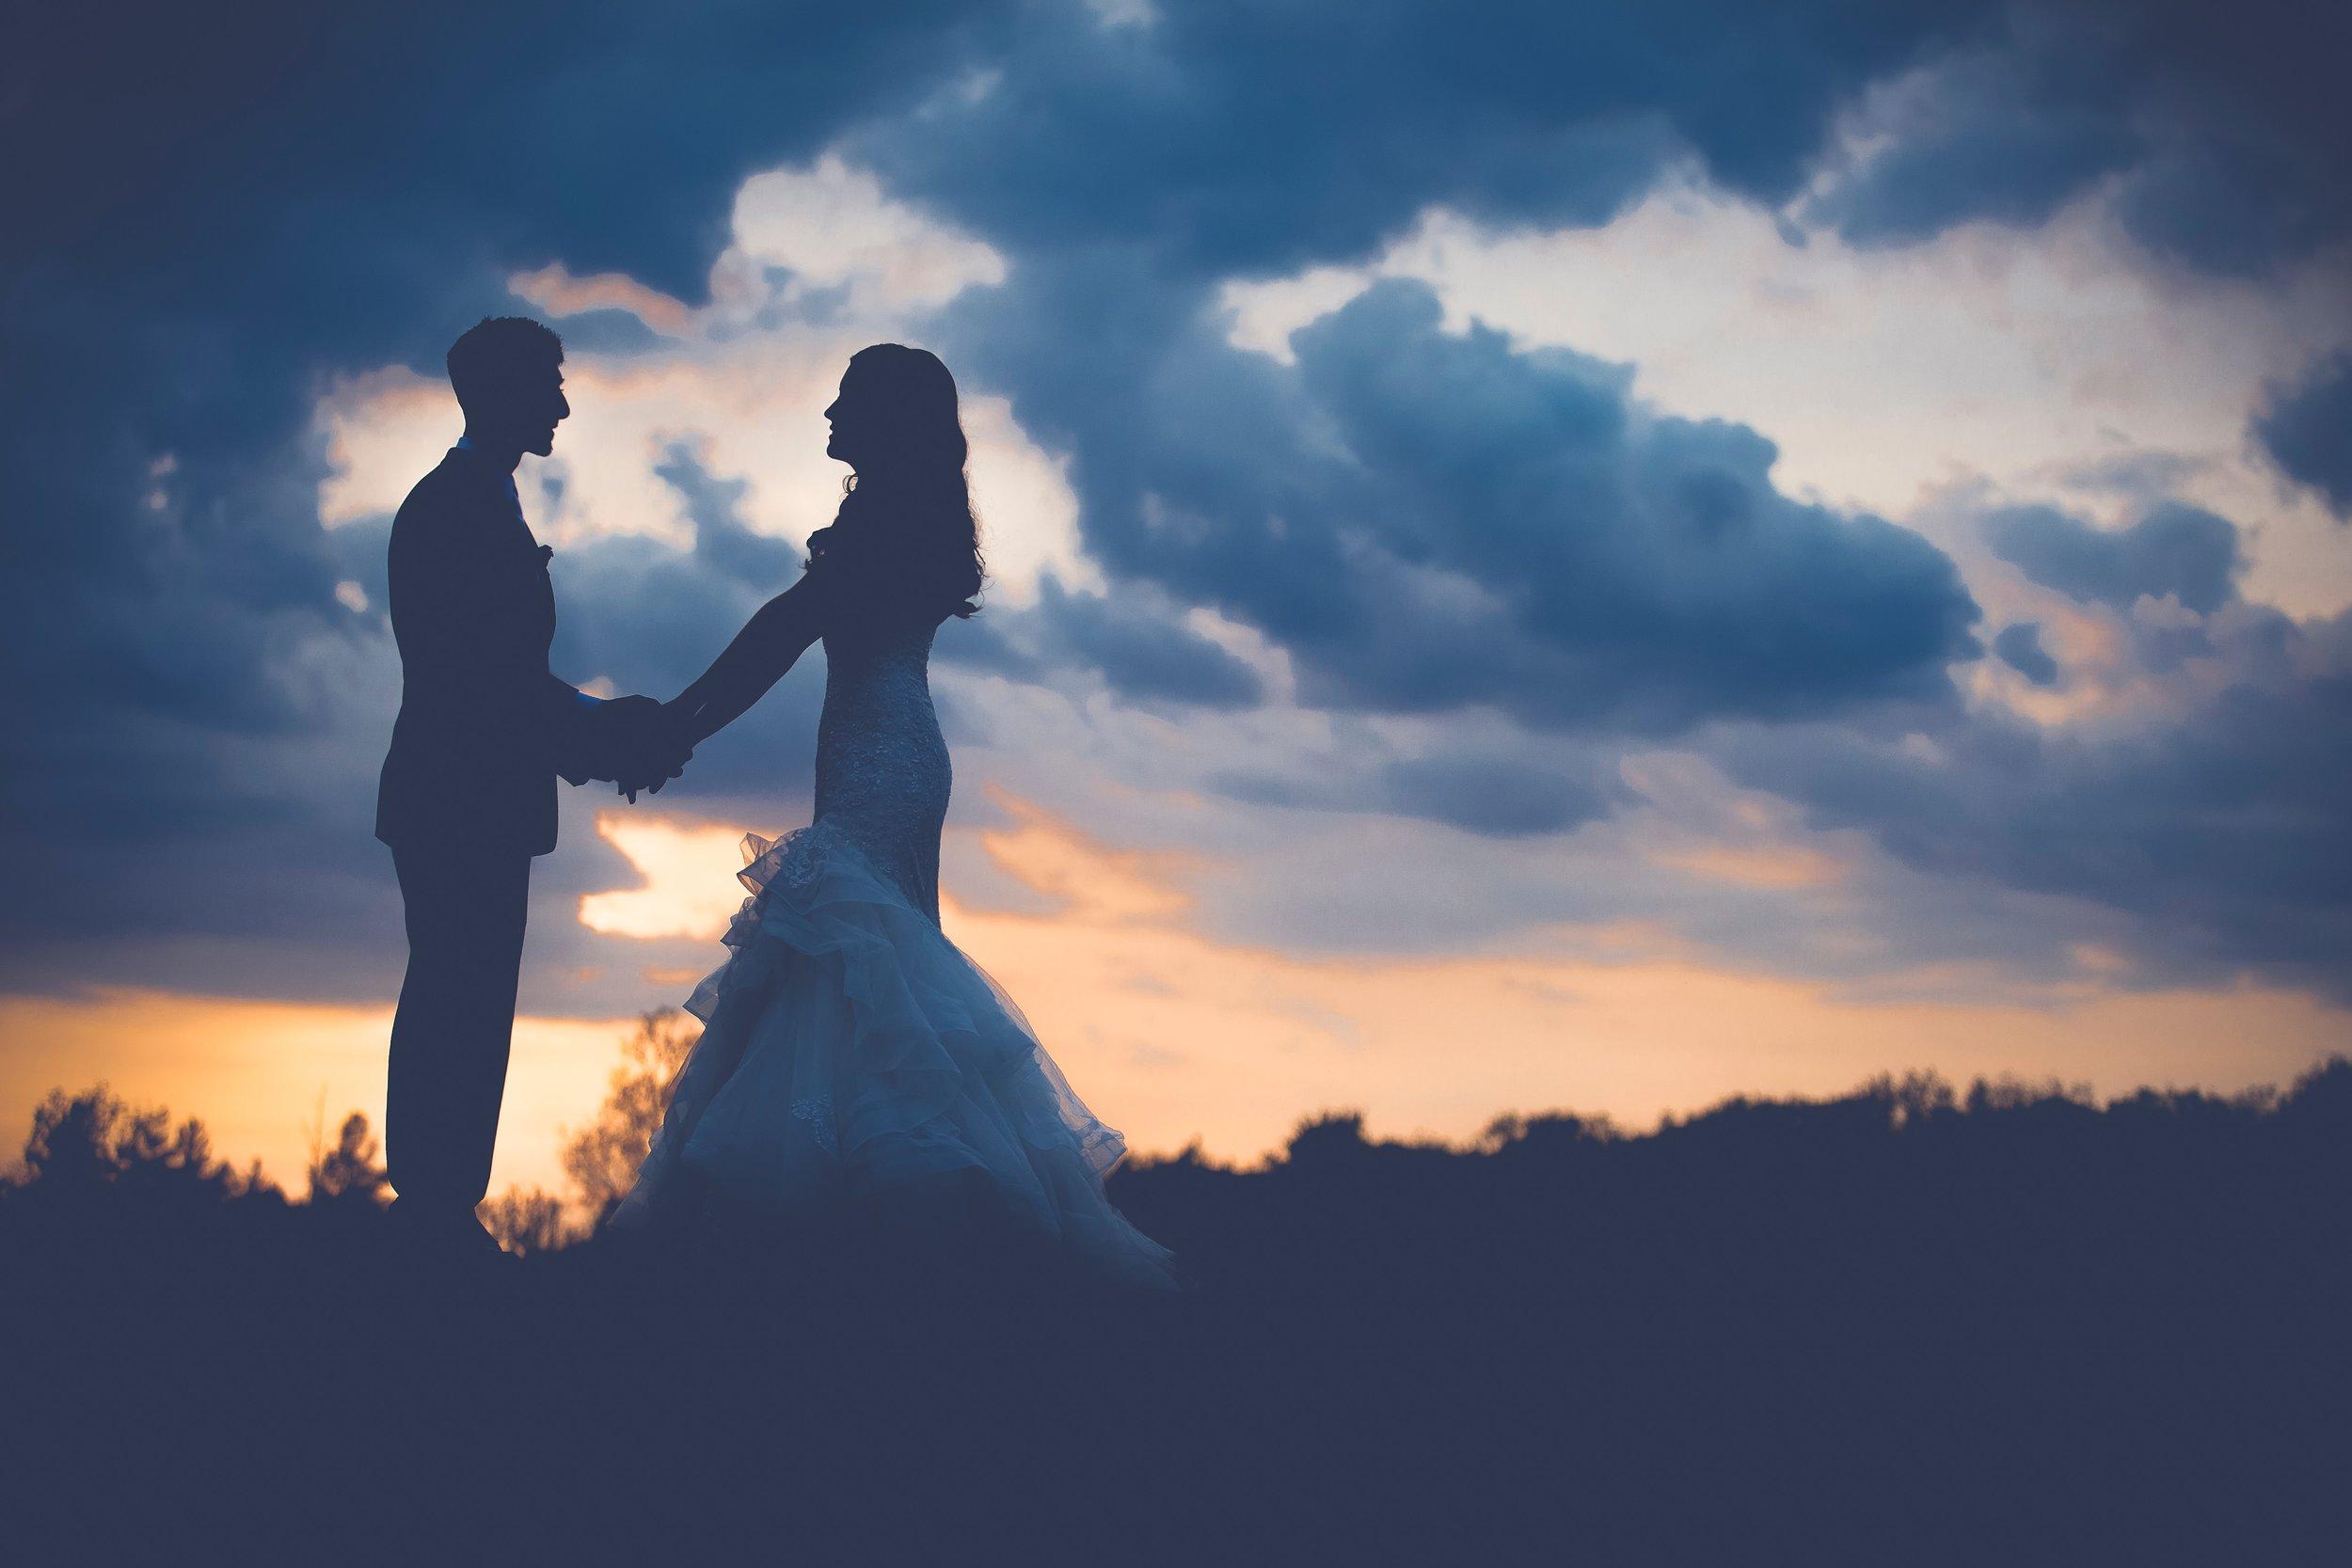 Weddings at SLC -